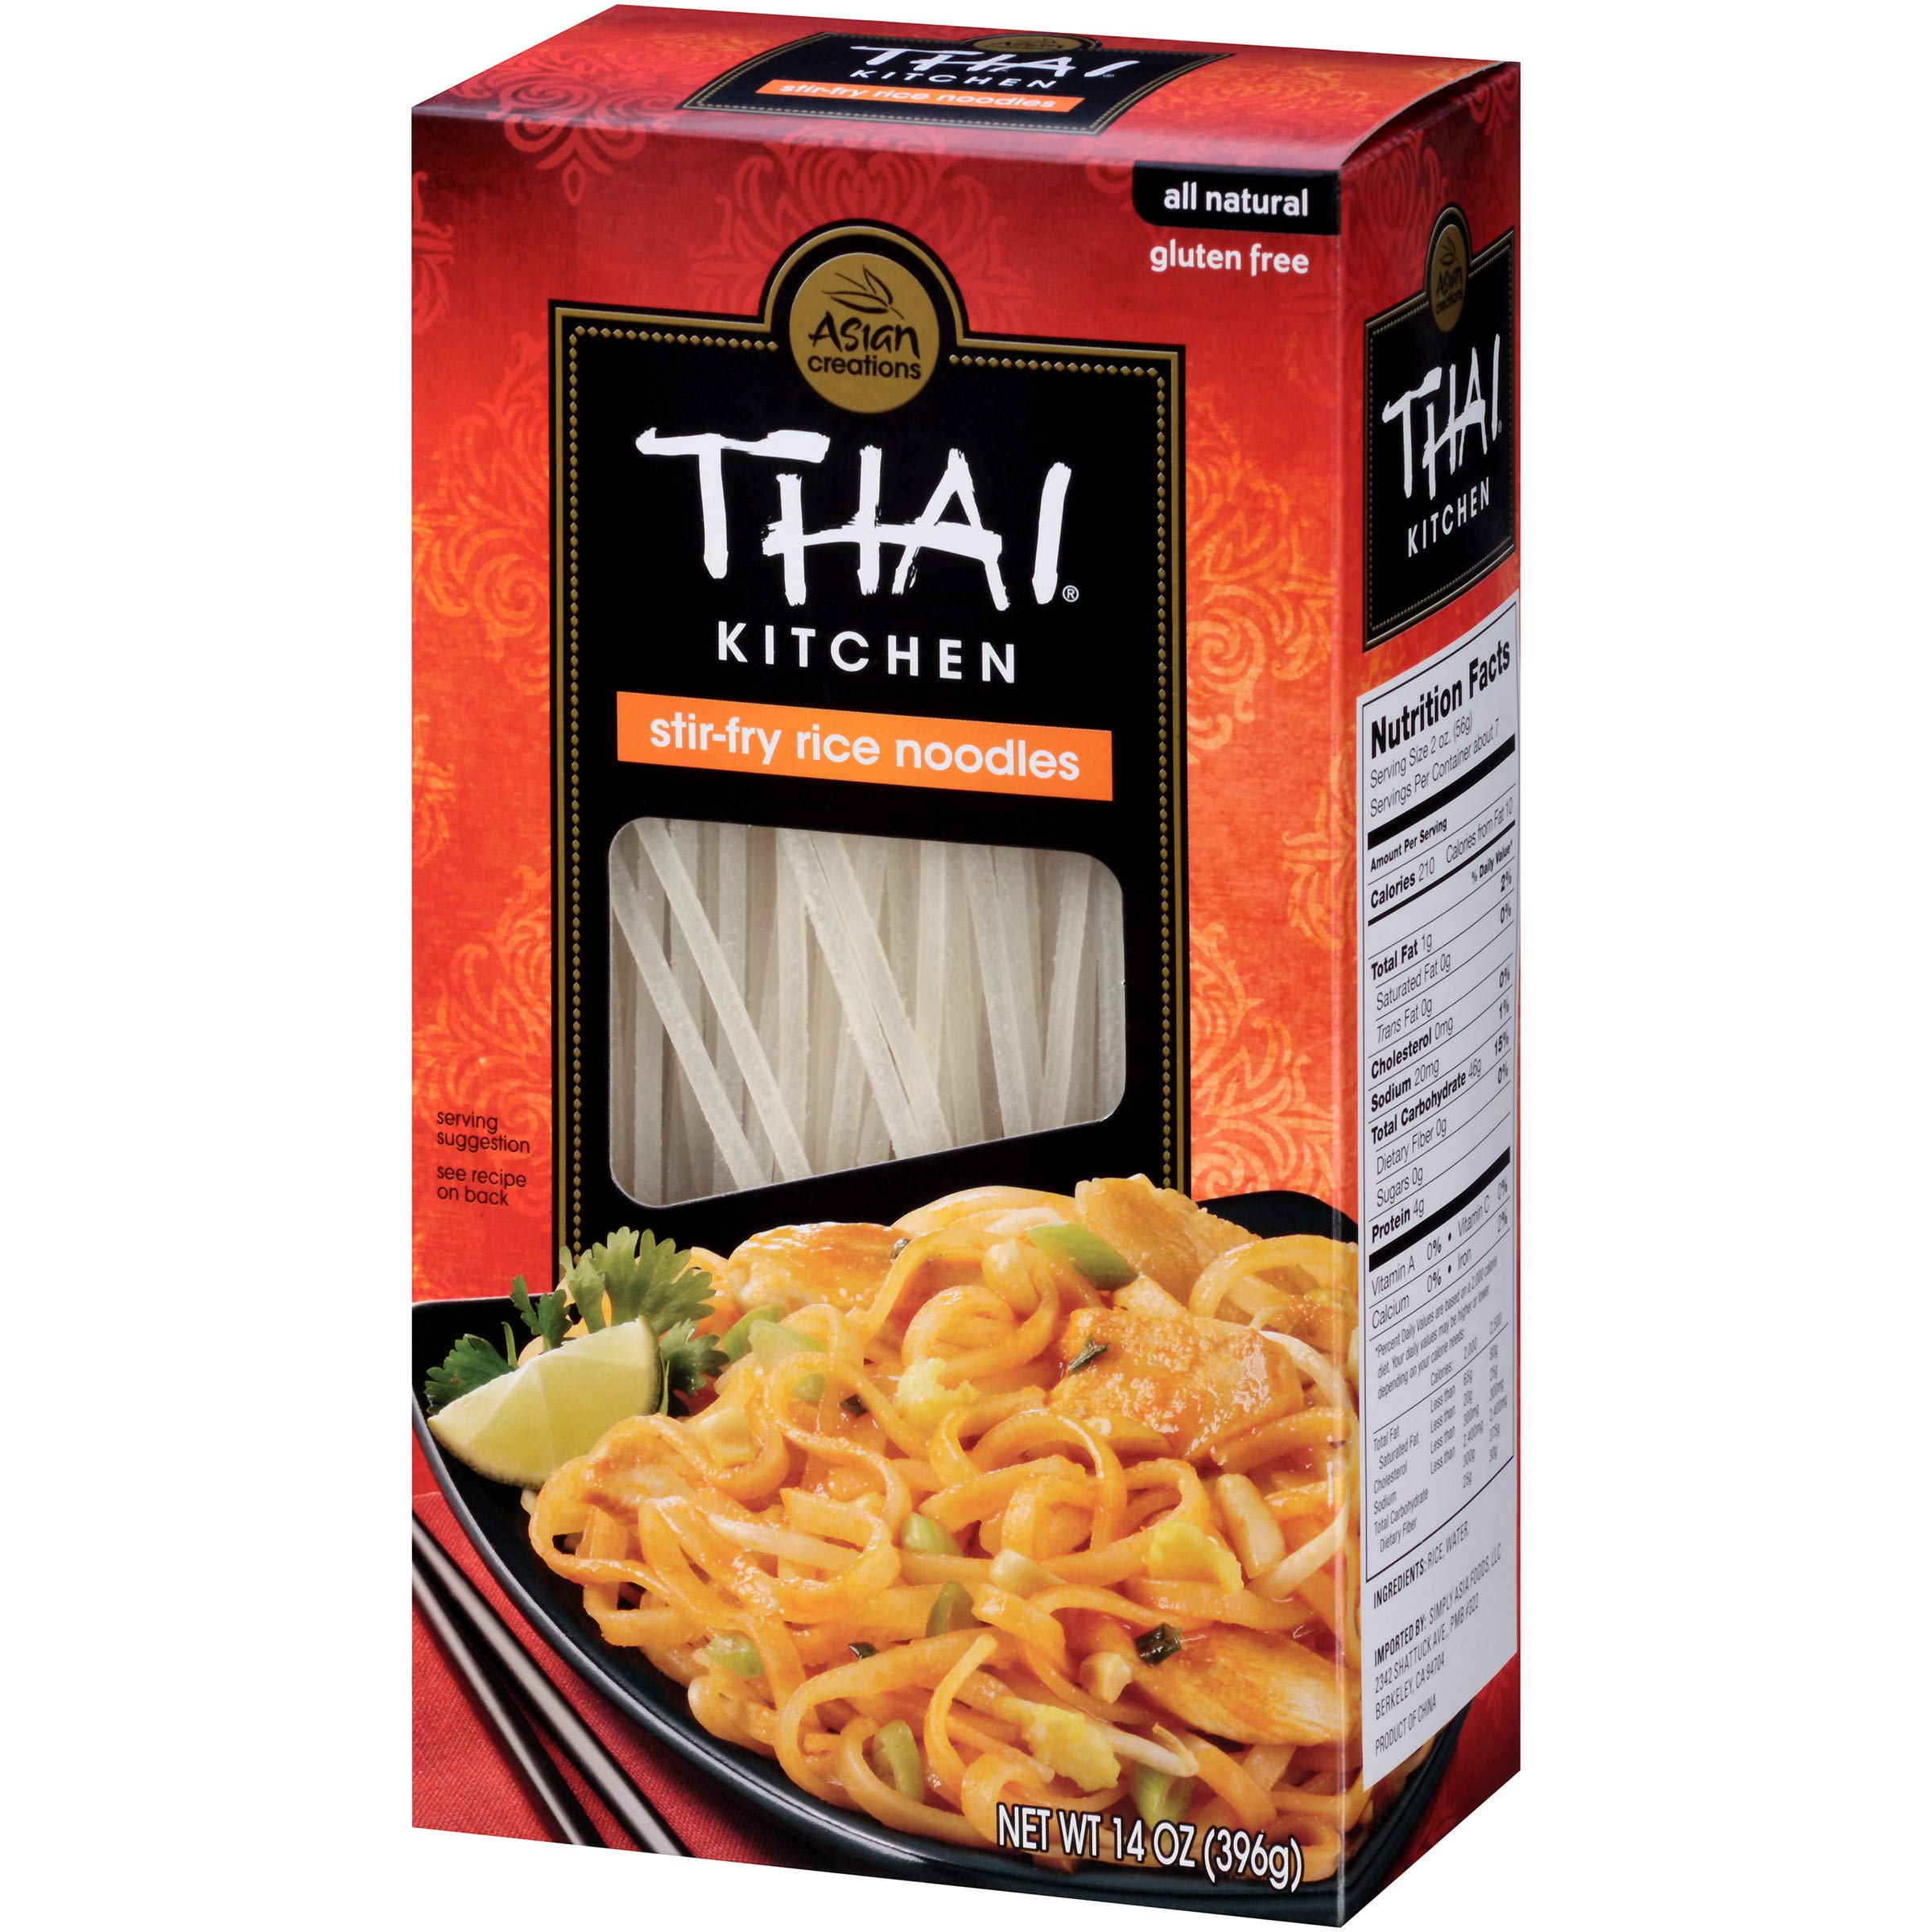 Amazon.com : Thai Kitchen Gluten Free Thin Rice Noodles, 8